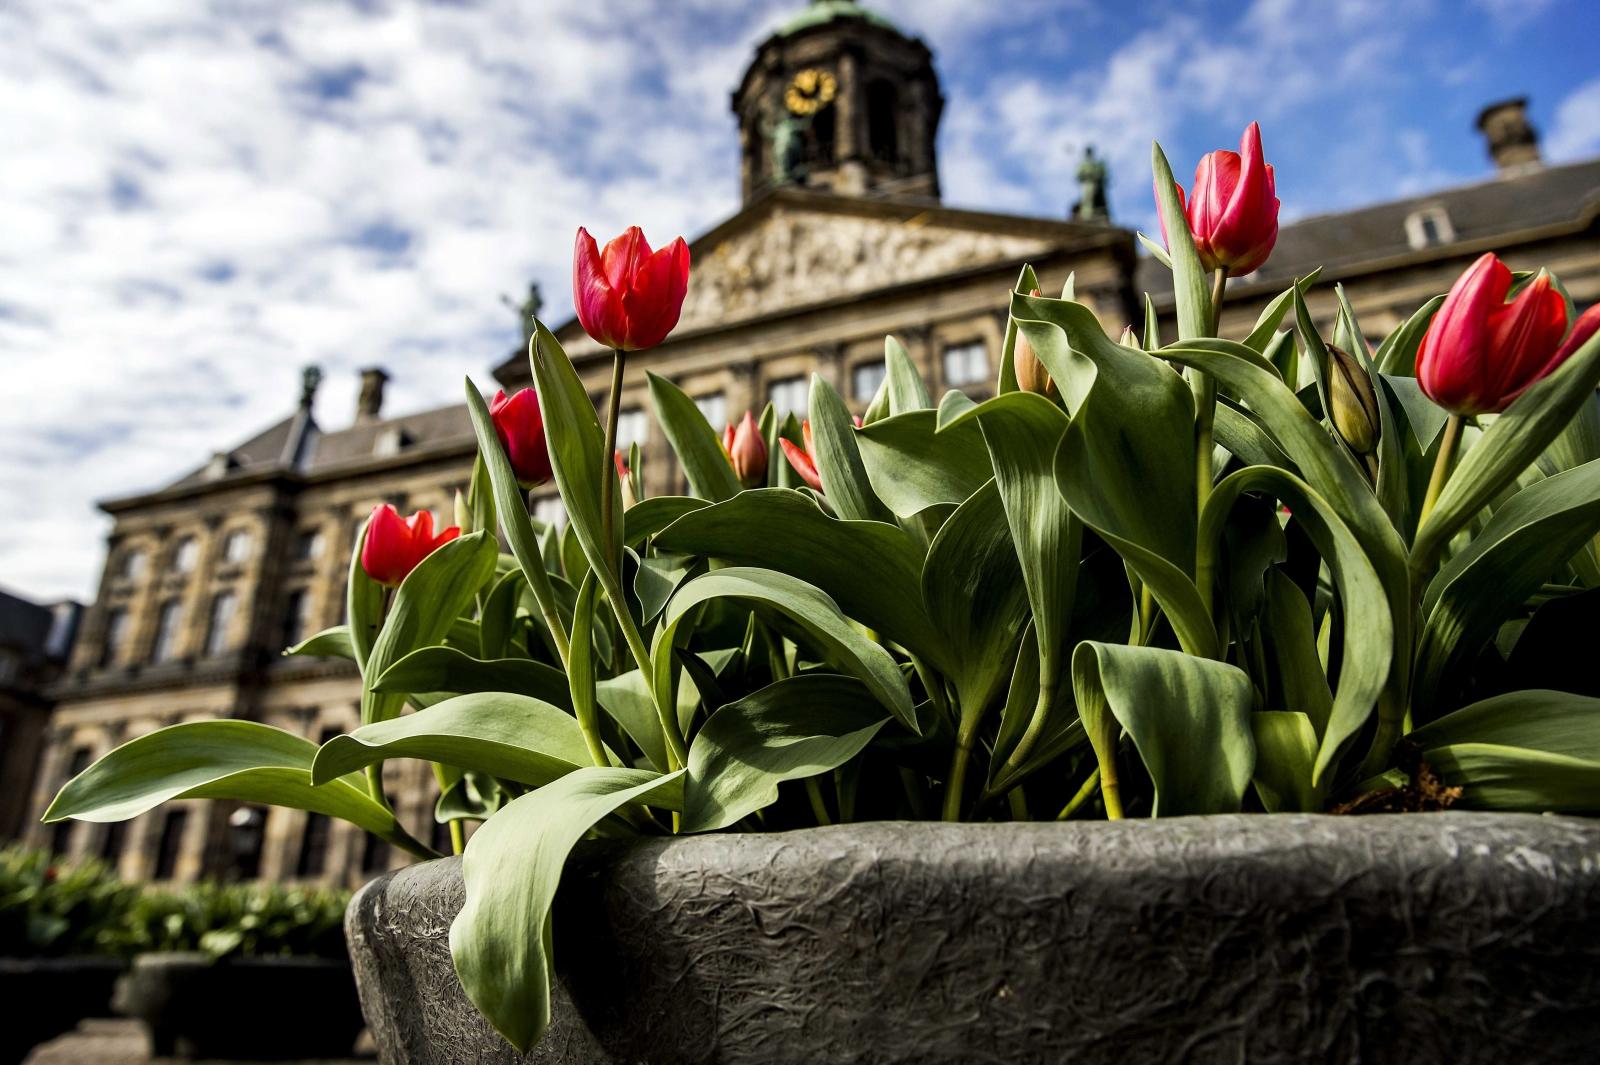 Oficjalne otwarcie Amsterdamskiego Festiwalu Tulipanów. Fot. PAP/EPA/Koen van Weel